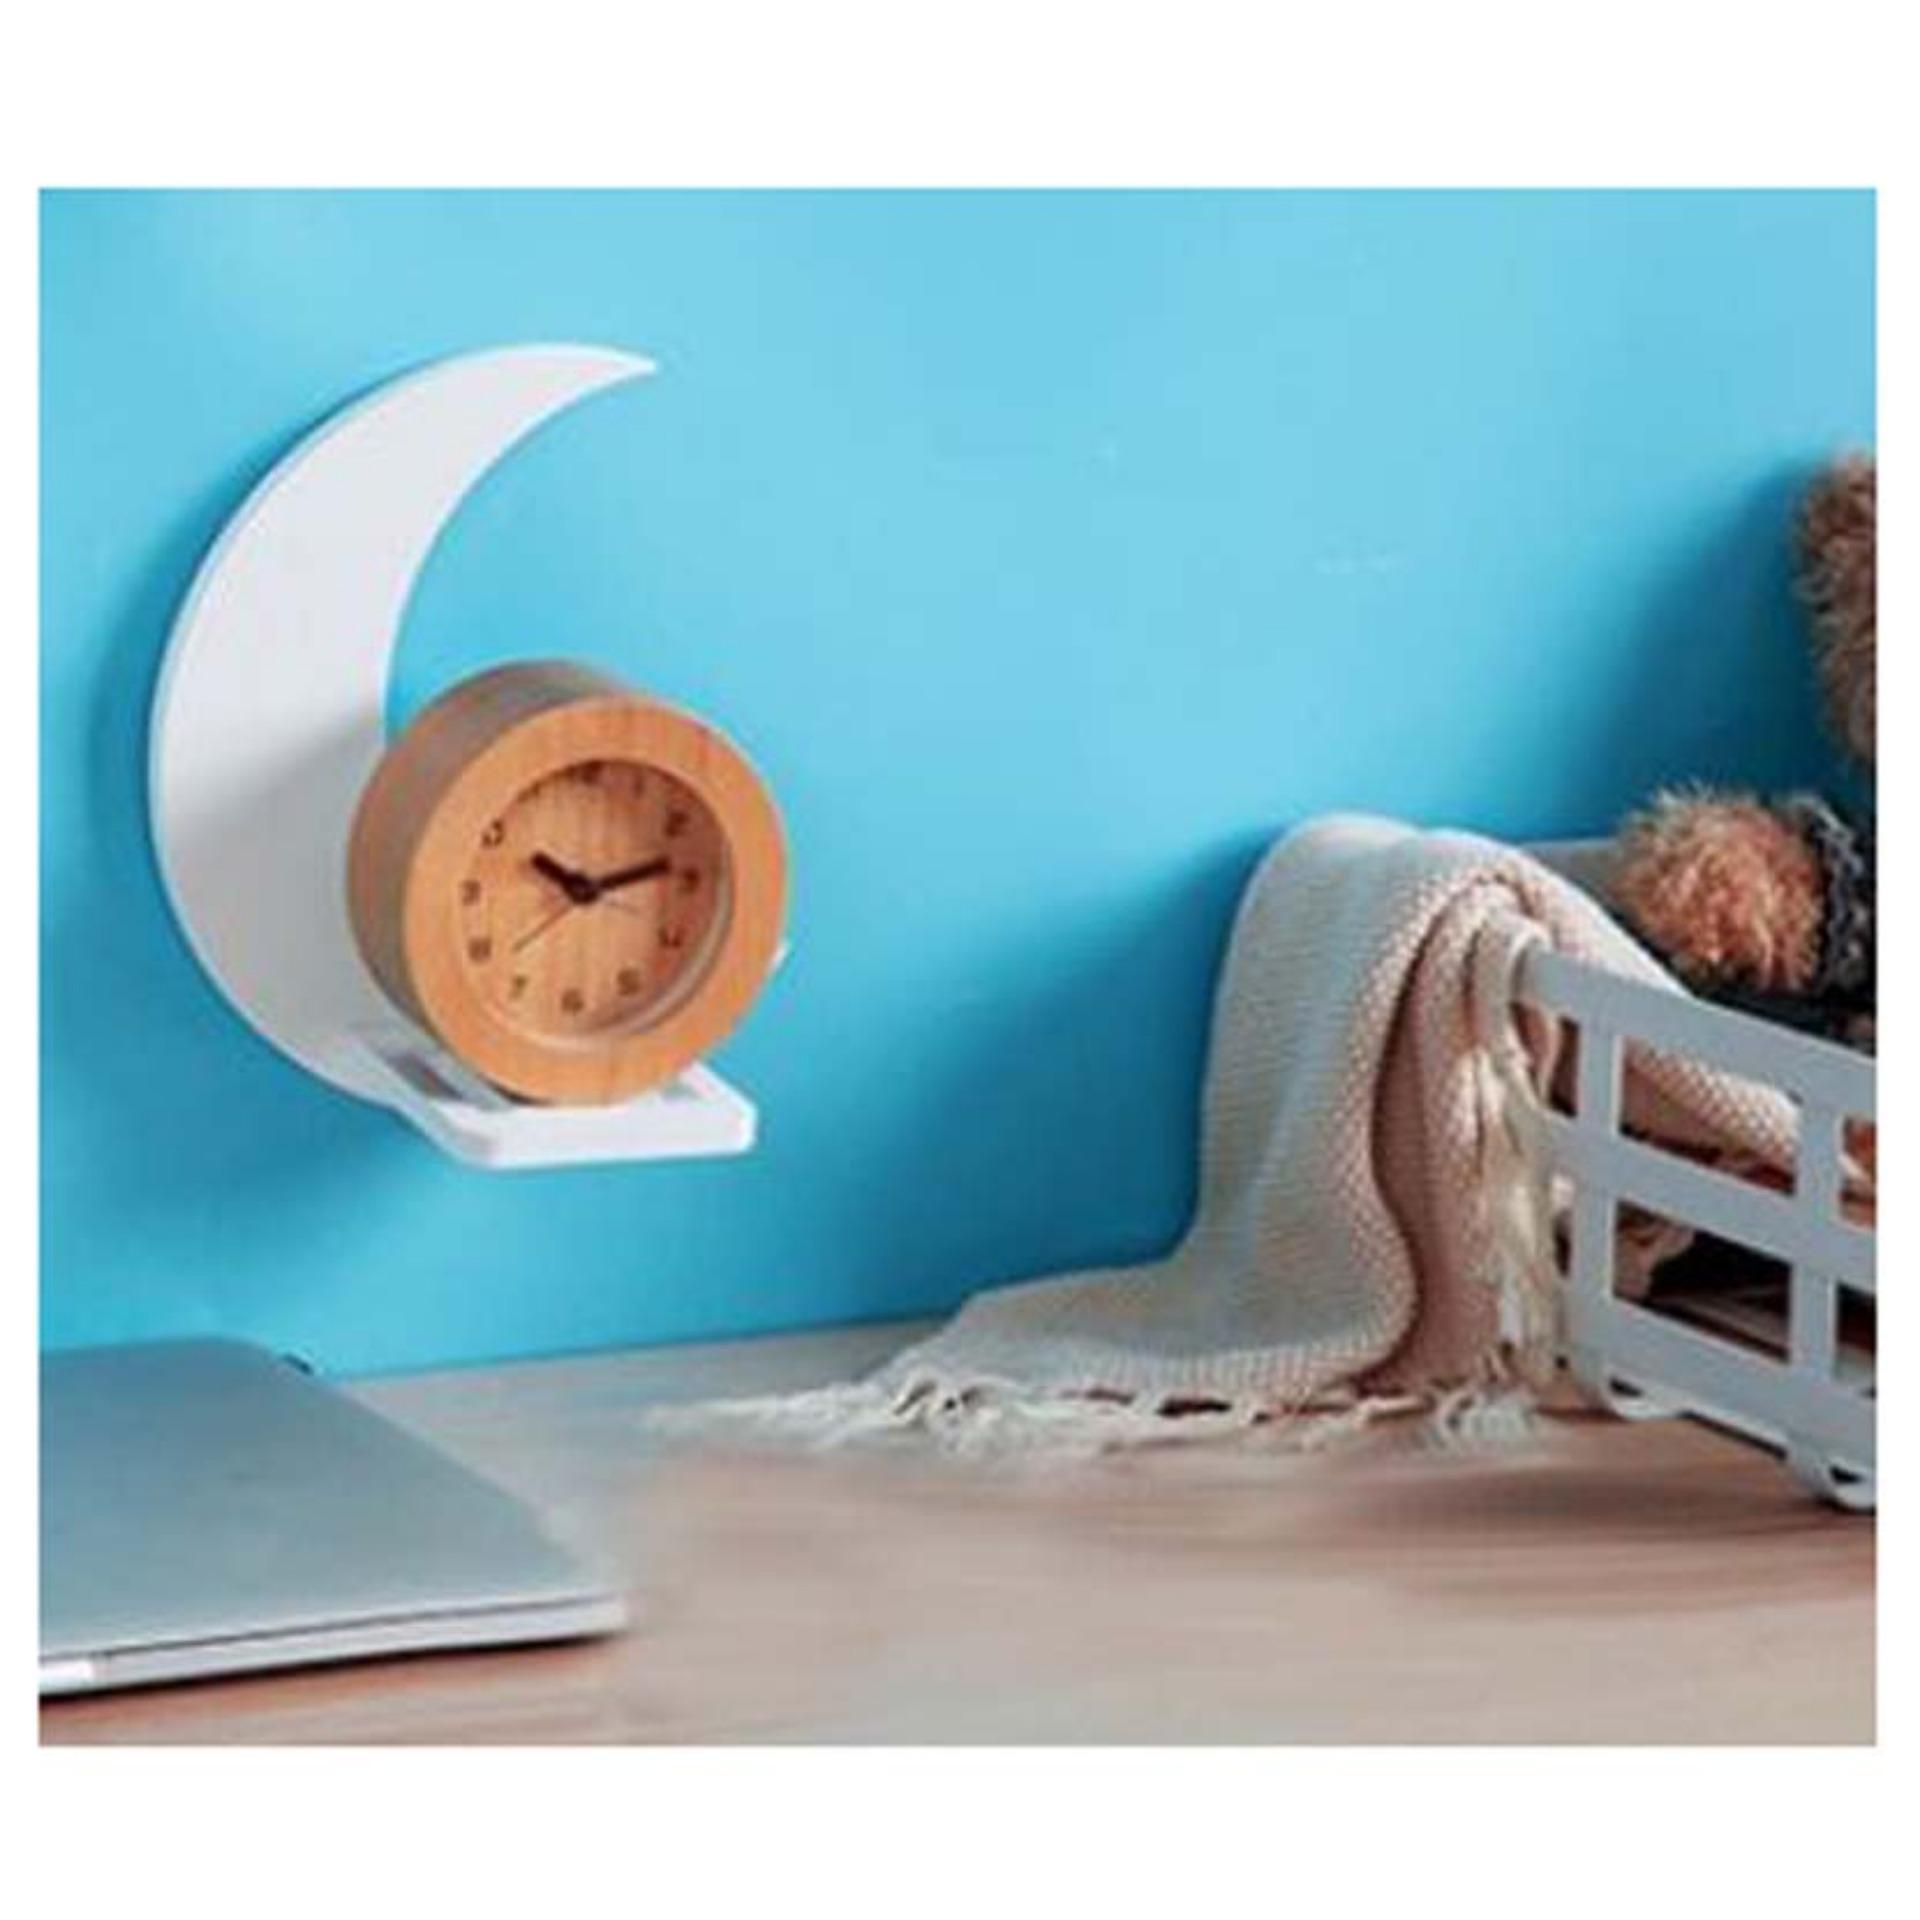 Harga 1 Set Isi 4 Pcs Tulisan Love Furniture Rak Pajangan Hiasan 2 Moon Hotel Penginapan Kos Kosan Kontrakan Sewa